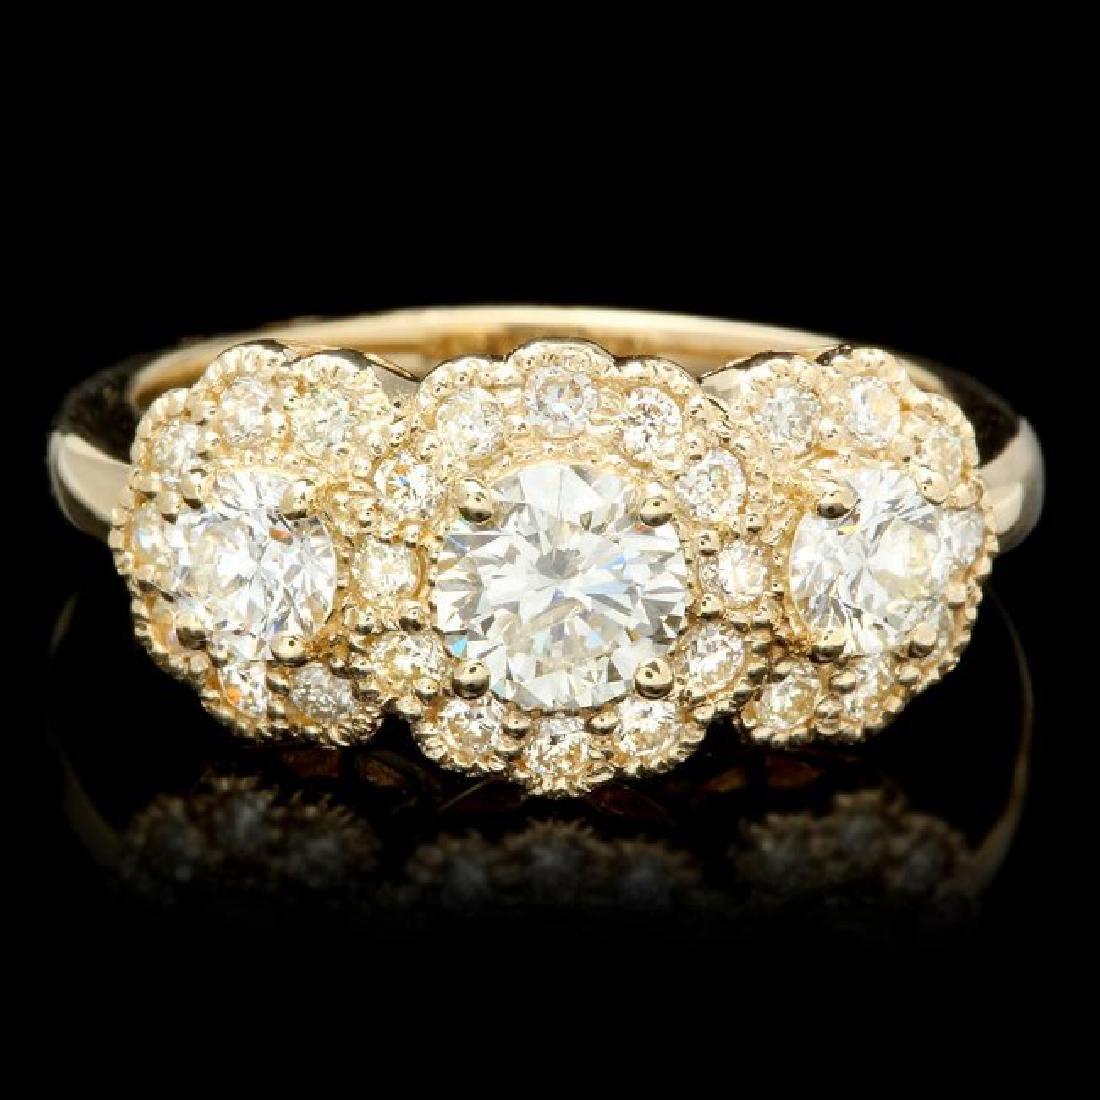 14k Yellow Gold 1.6ct Diamond Ring